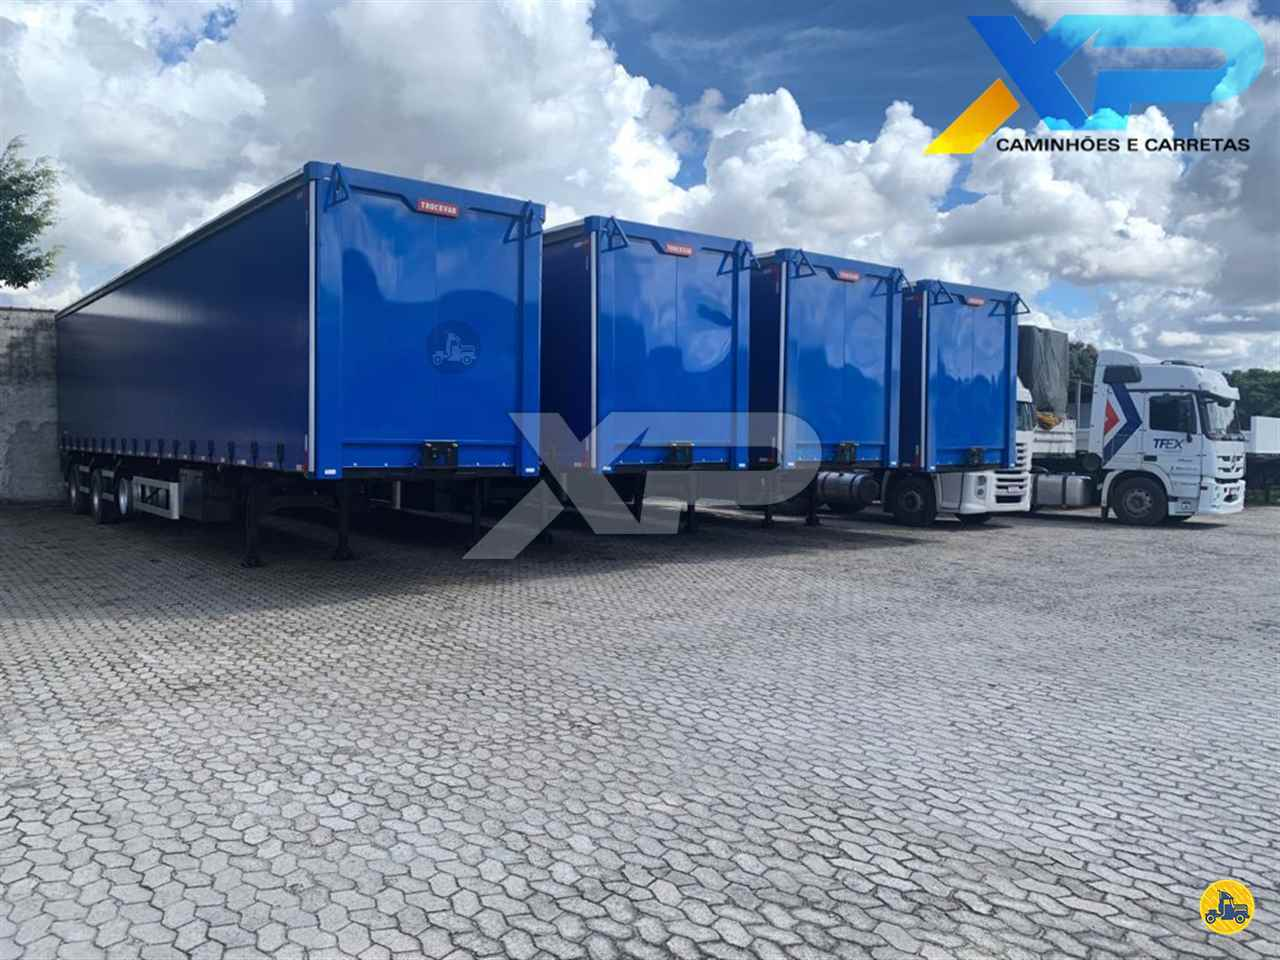 CARRETA SEMI-REBOQUE BAU SIDER Rebaixada XP Caminhões SERRA ESPÍRITO SANTO ES